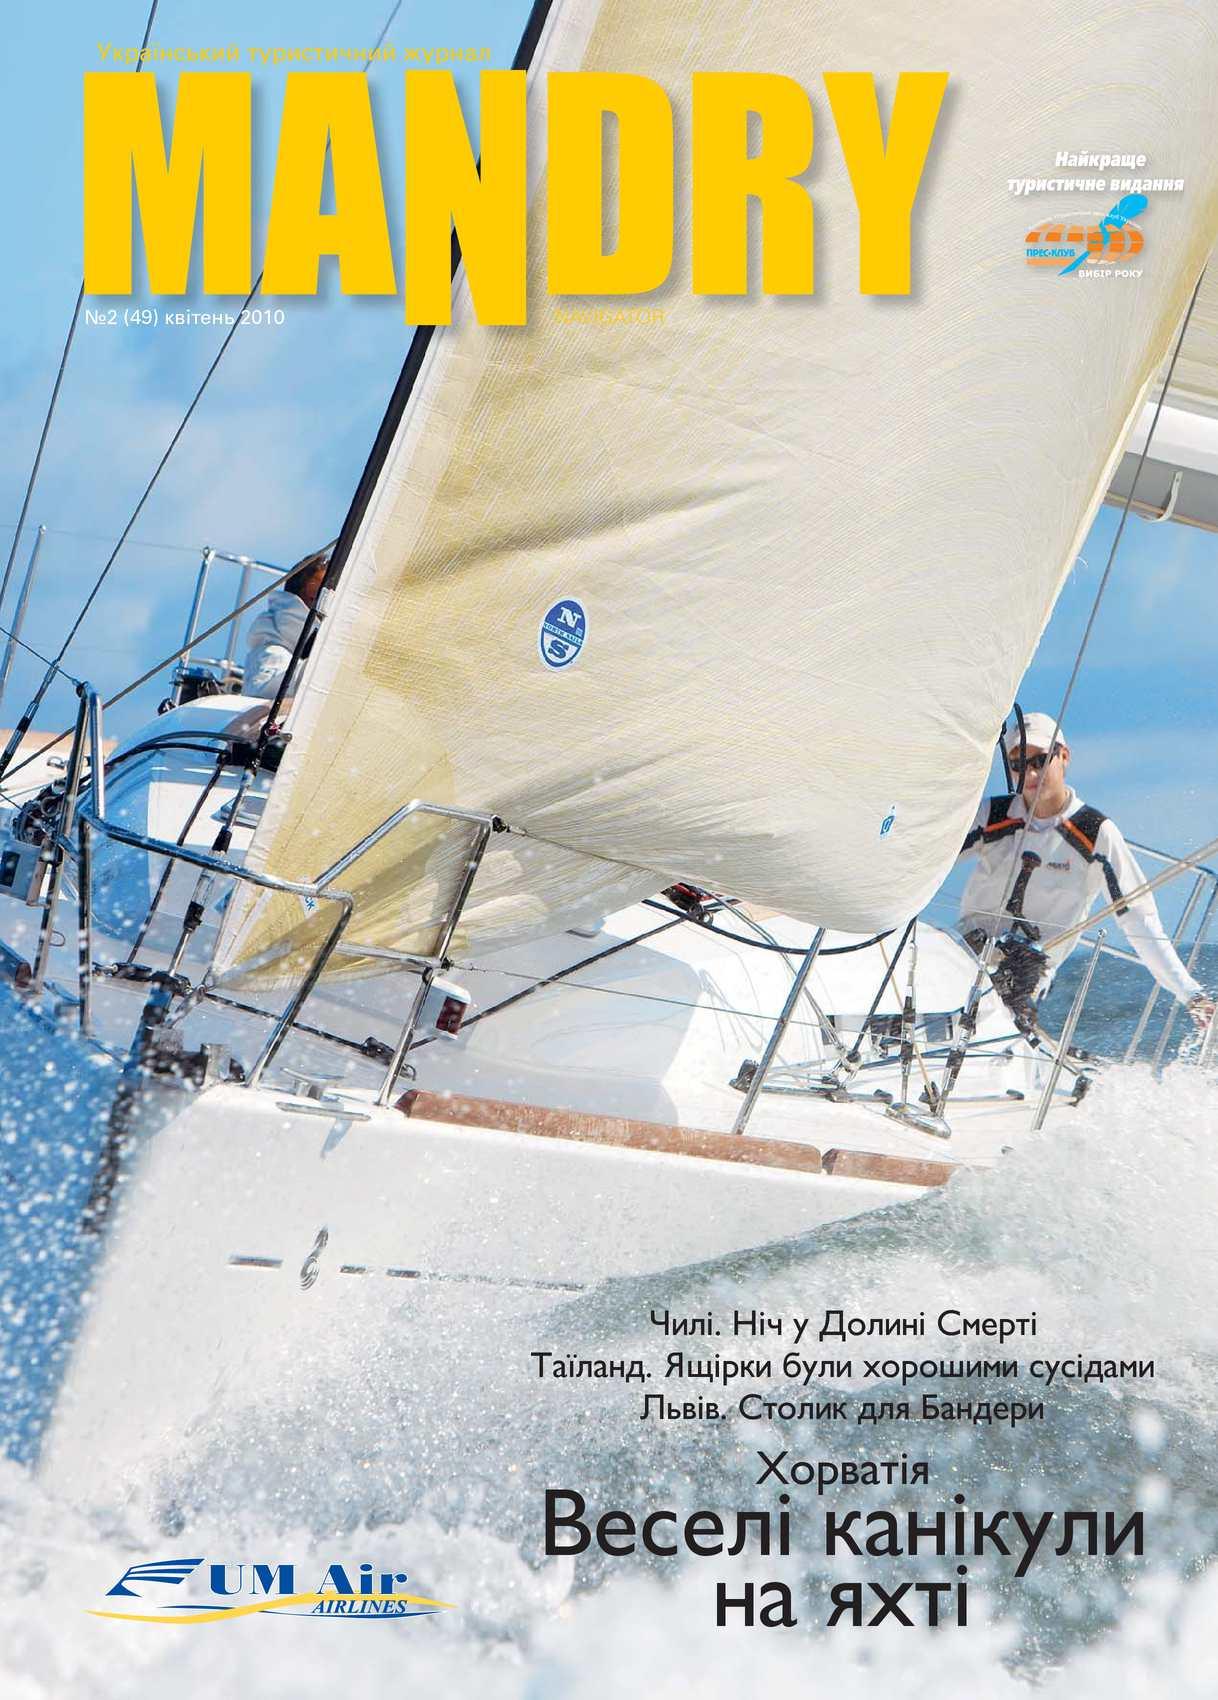 Calaméo - Журнал Mandry №49 2010 8fa56c6ca713e